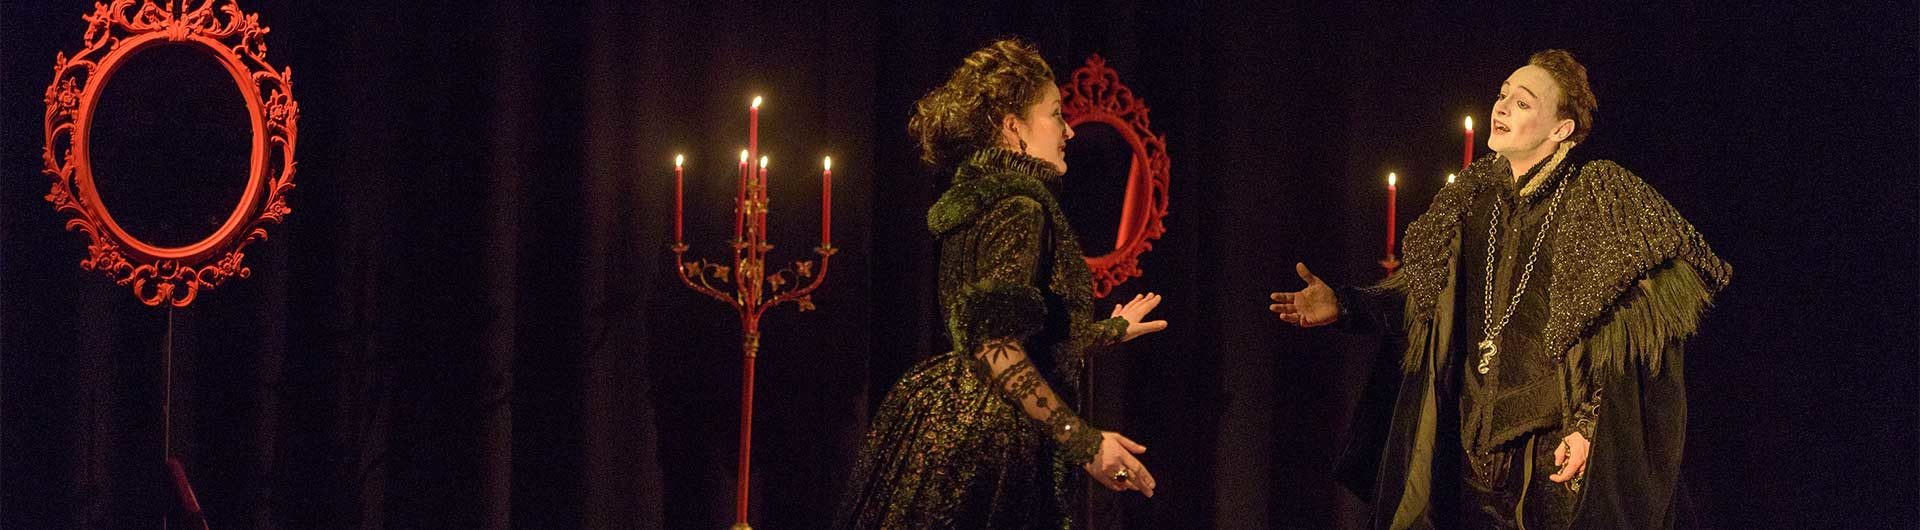 2018 production of Rodelinda, Cambridge Handel Opera Company © Jean-Luc Benazet 2018